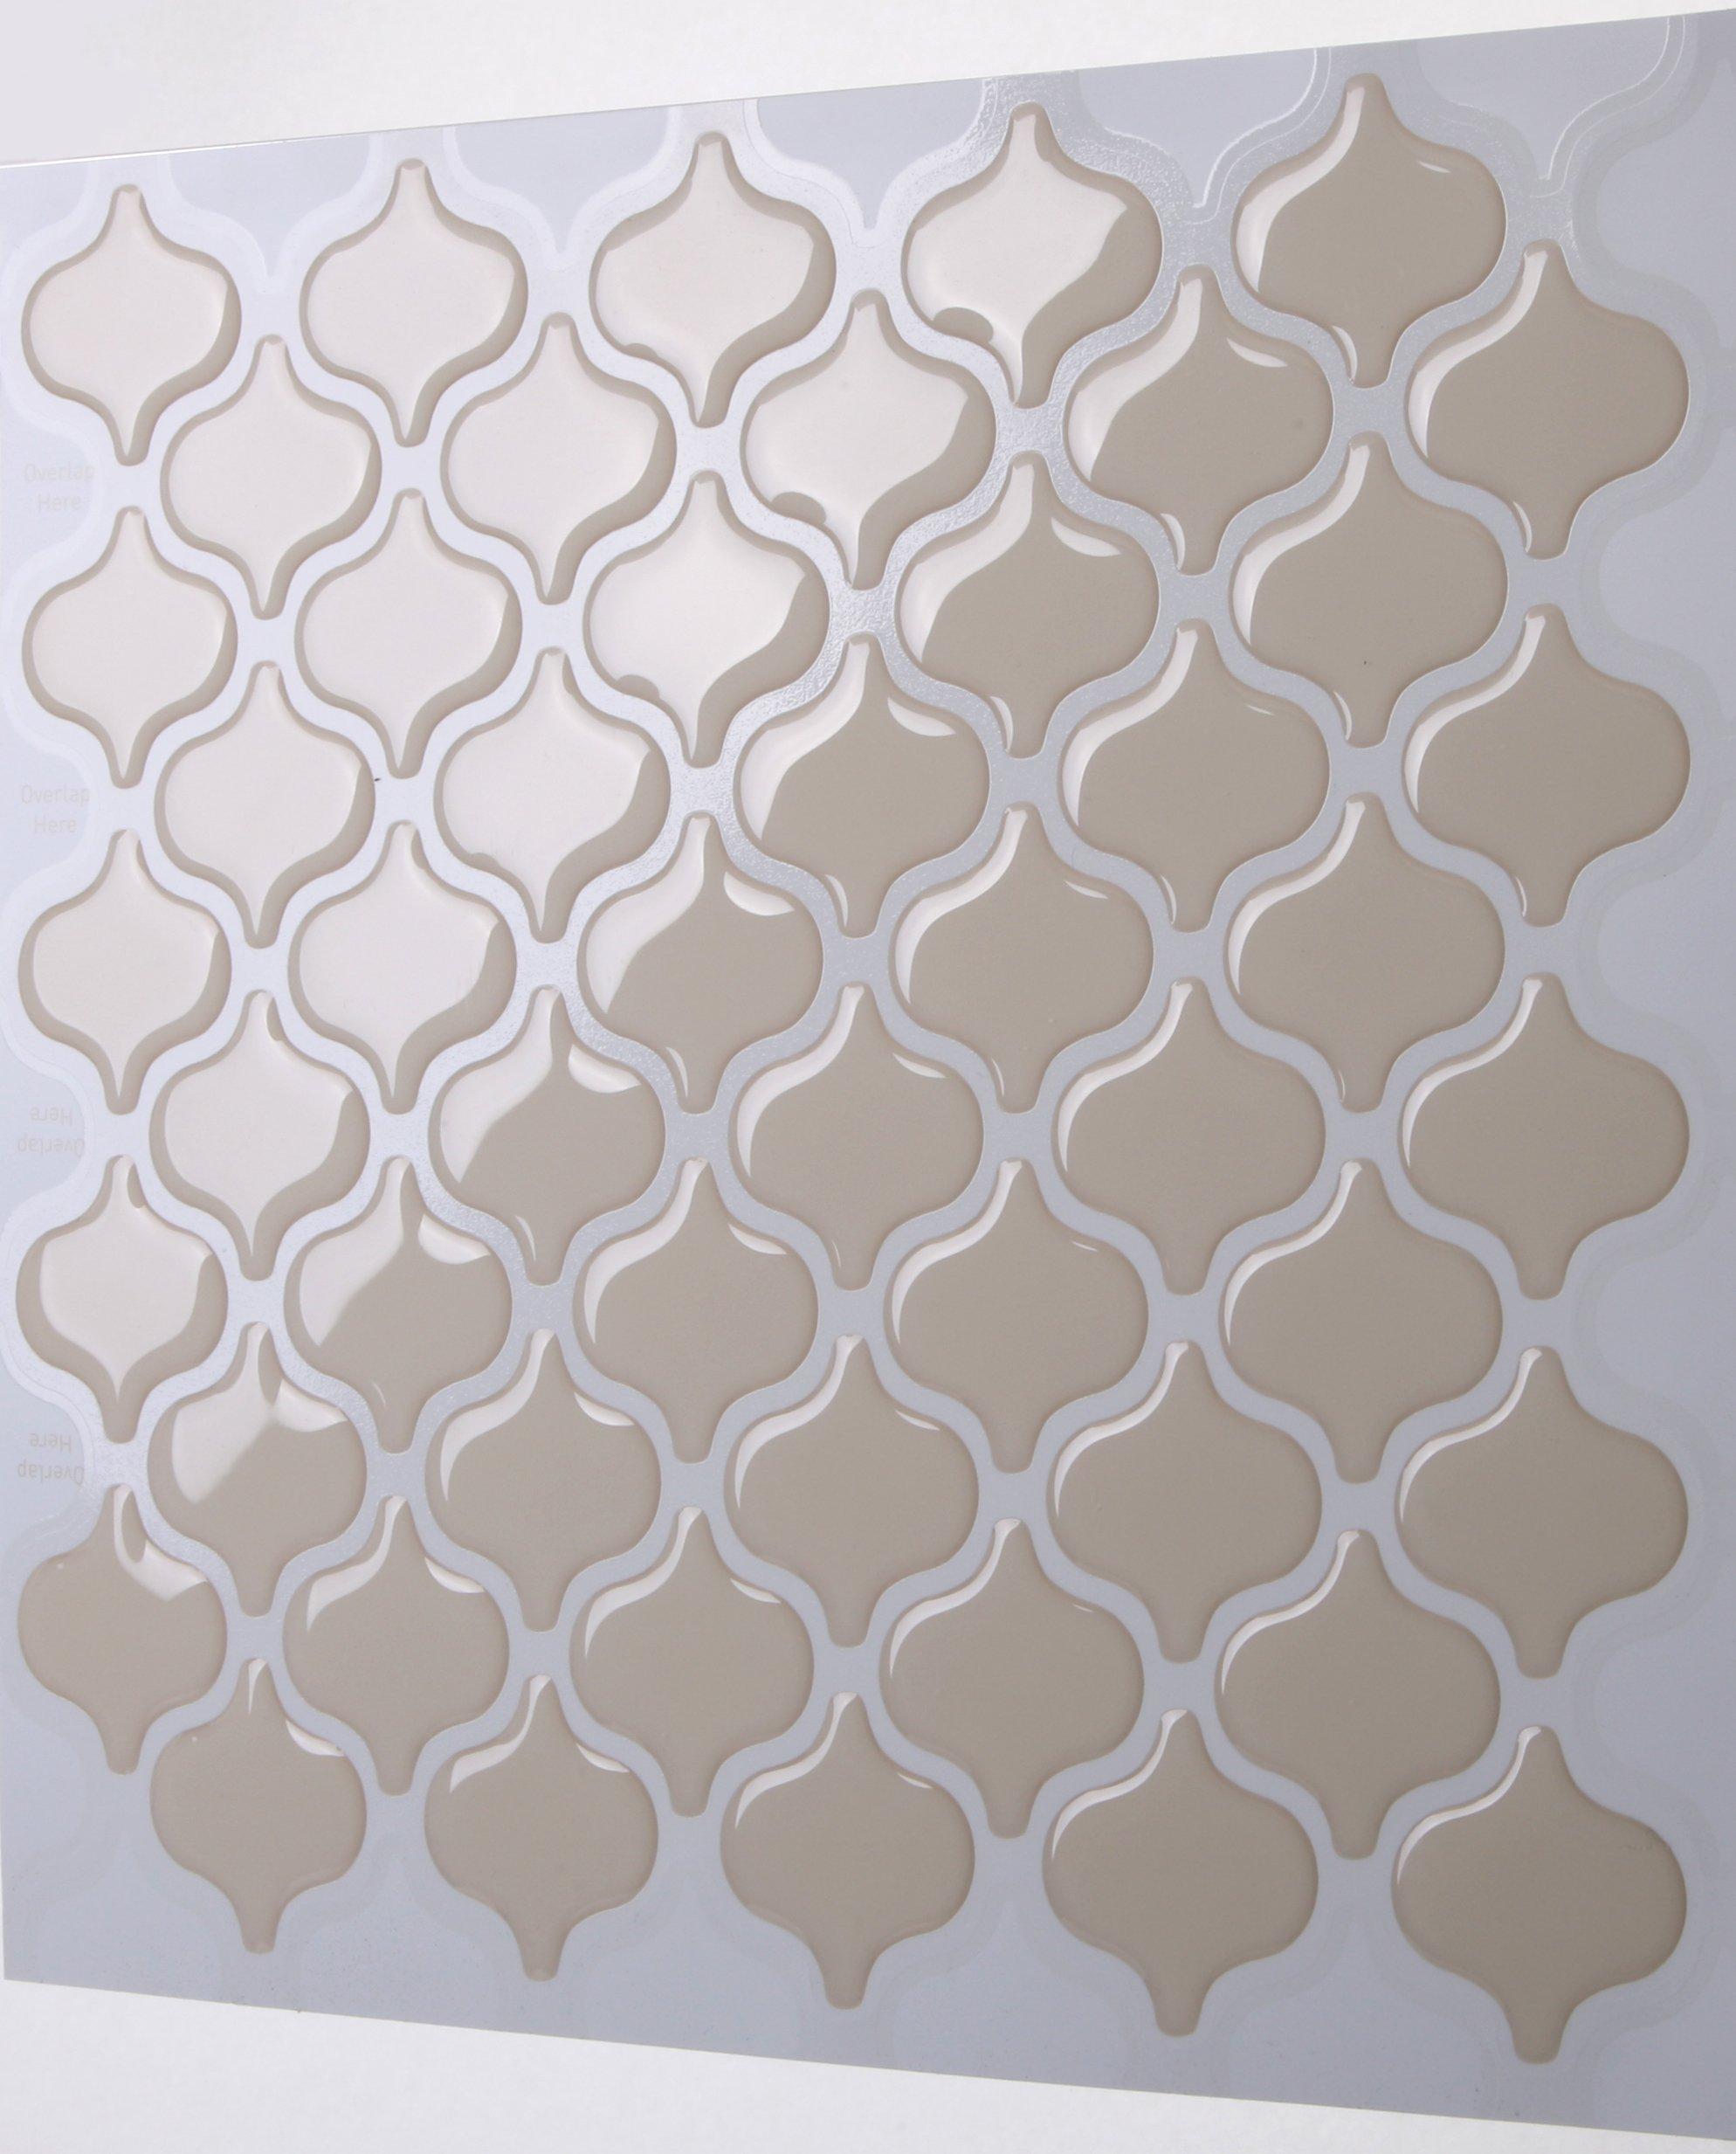 Tic Tac Tiles 5-Sheet Peel And Stick Self Adhesive